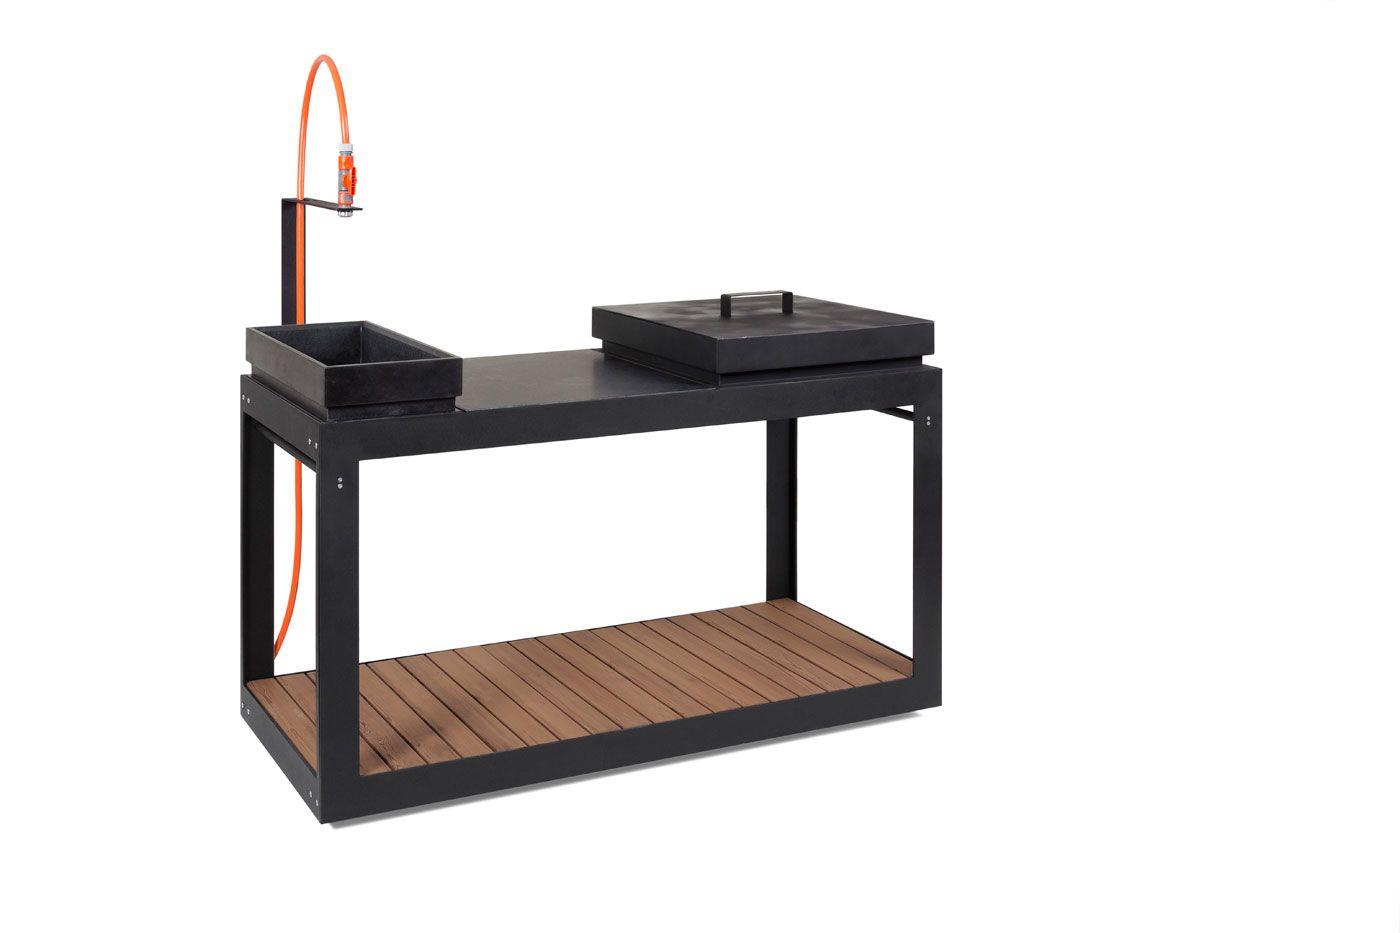 ulaelu modular outdoor kitchen | best modular outdoor kitchens ideas